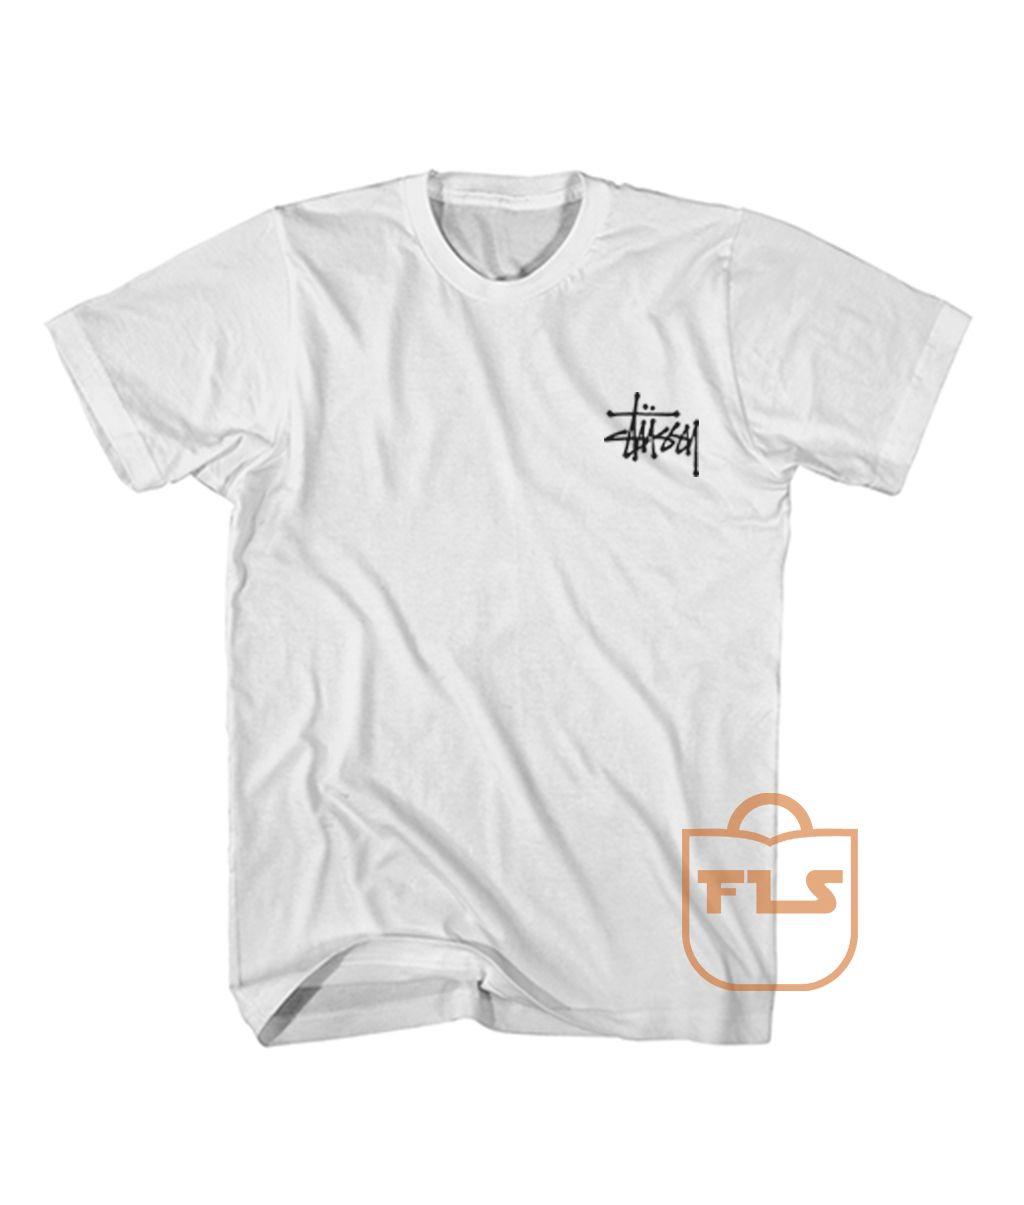 86d67e03 Buy Stussy Signature Pocket Men's Women's T Shirt - Price: $14.45 -  Ferolos.com #christmasgift